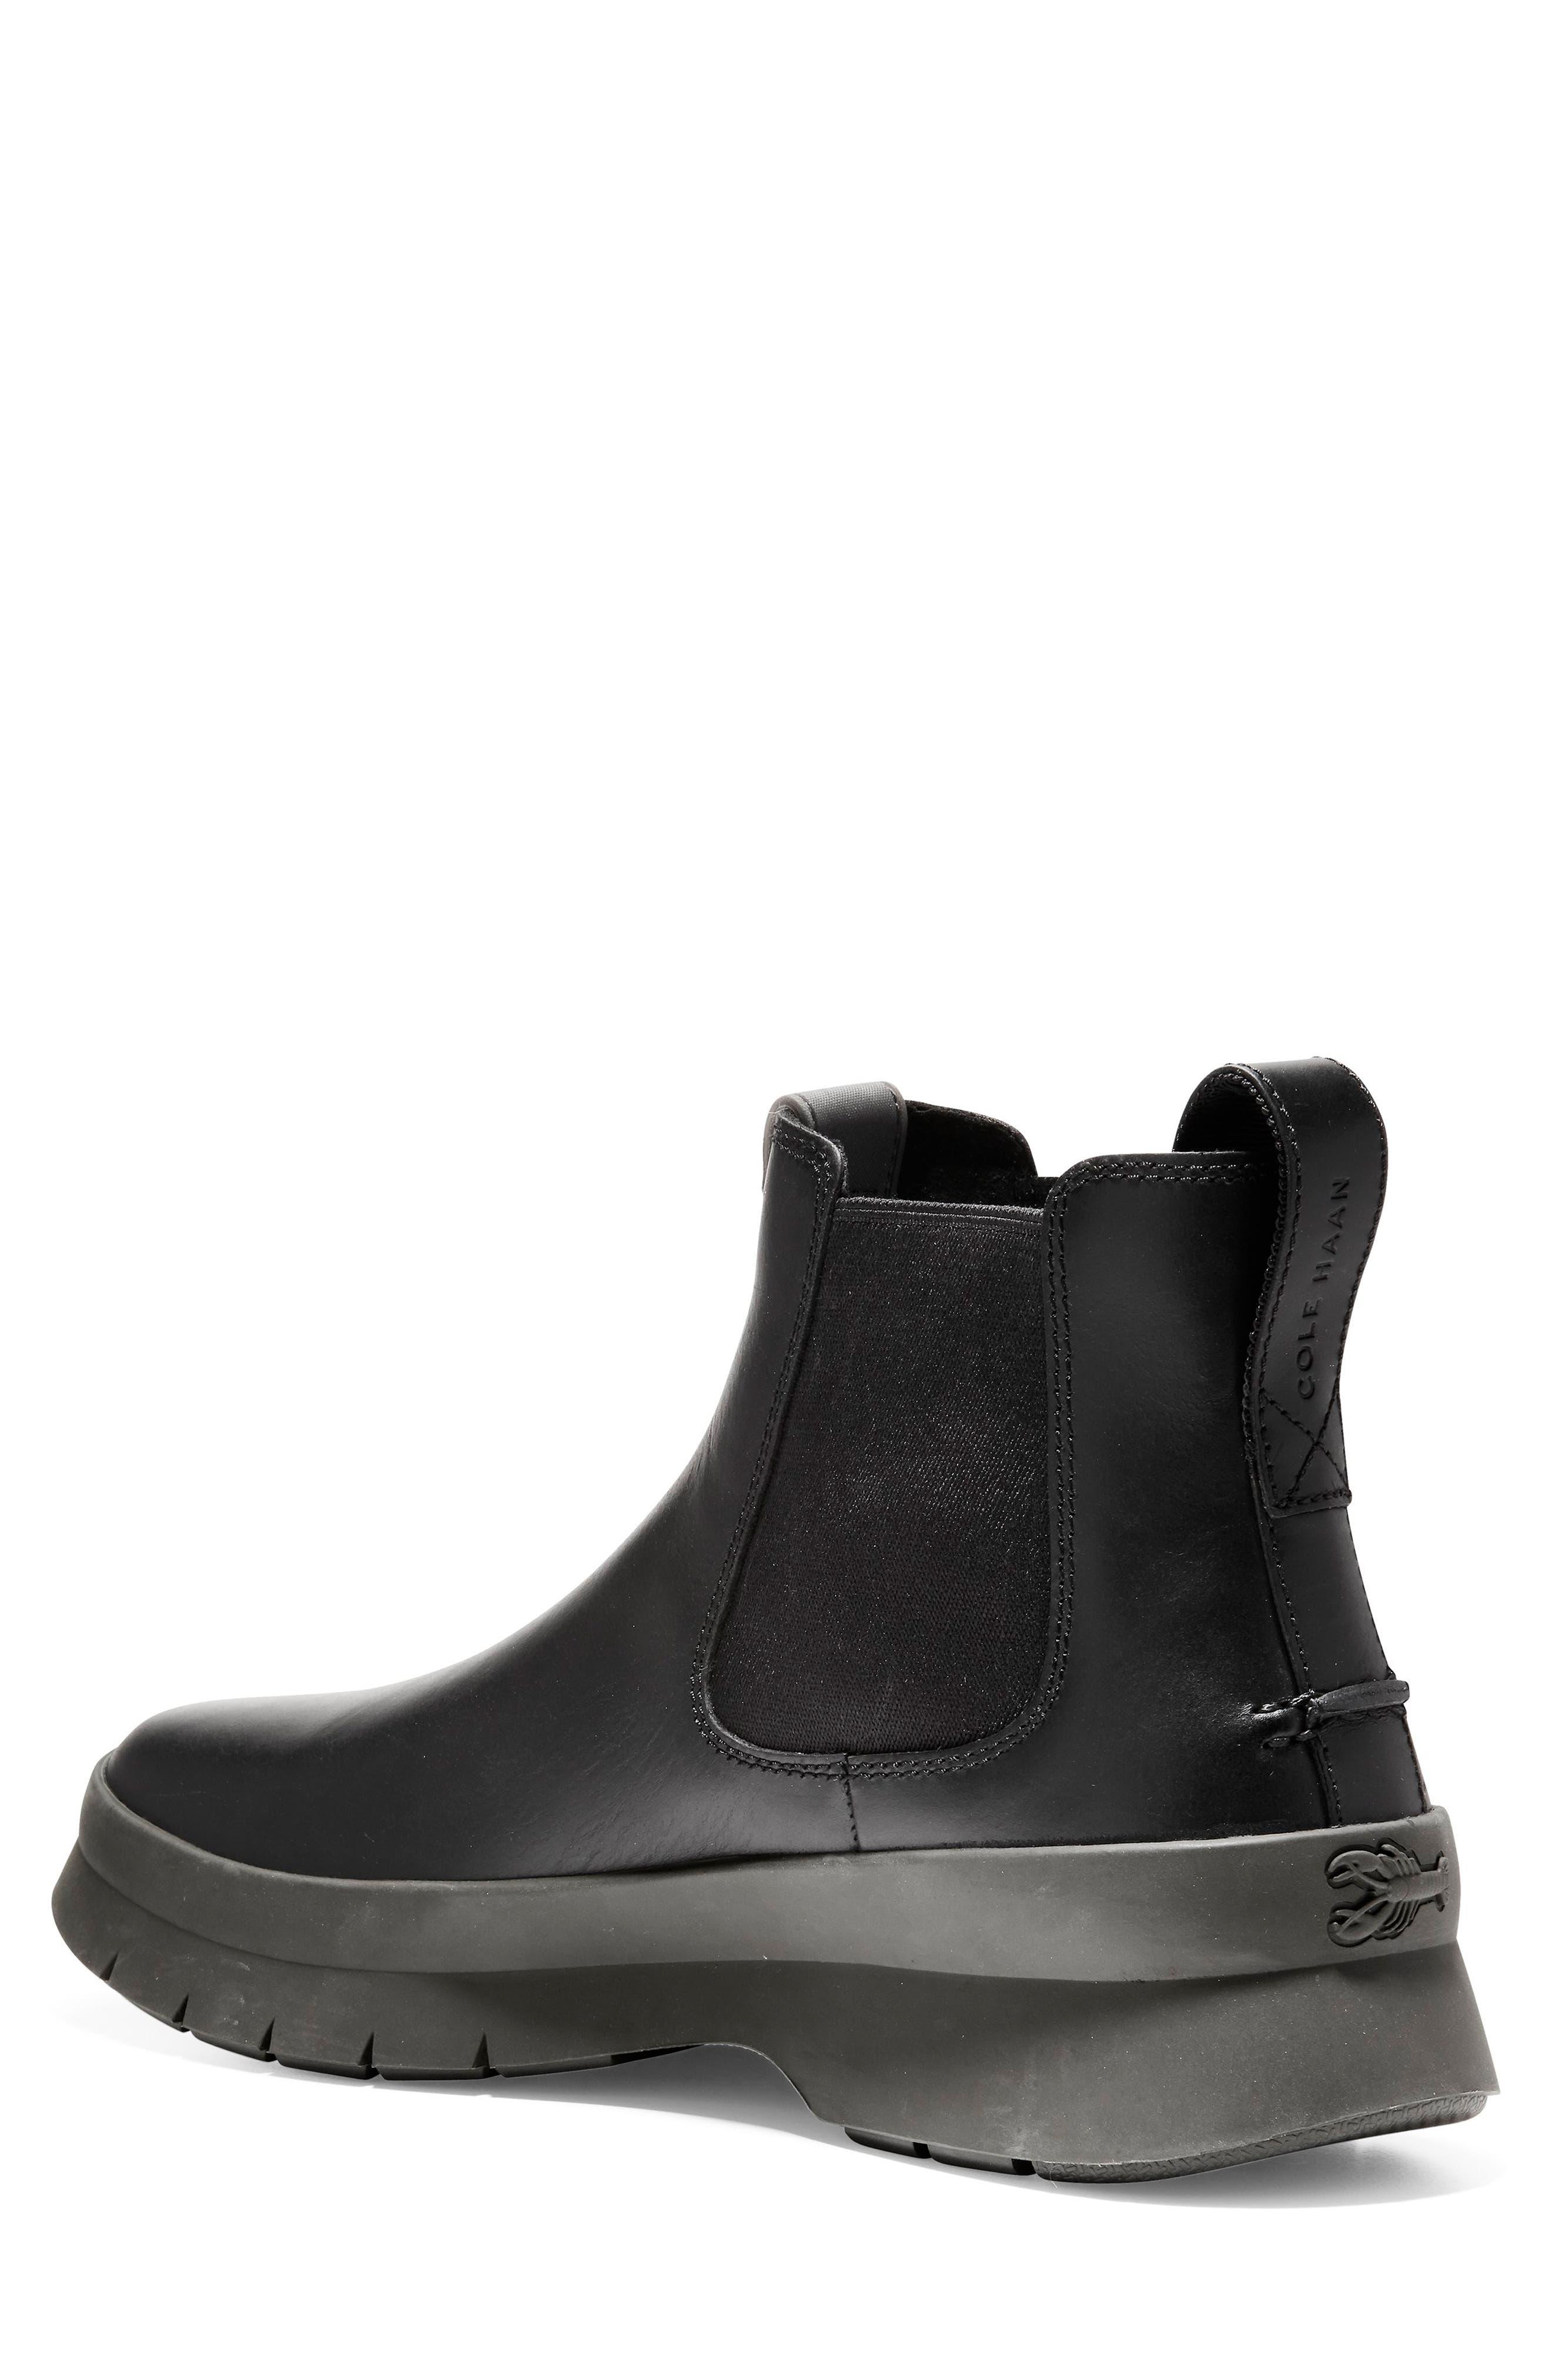 Pinch Utility Waterproof Chelsea Boot,                             Alternate thumbnail 2, color,                             BLACK/ HAZEL LEATHER